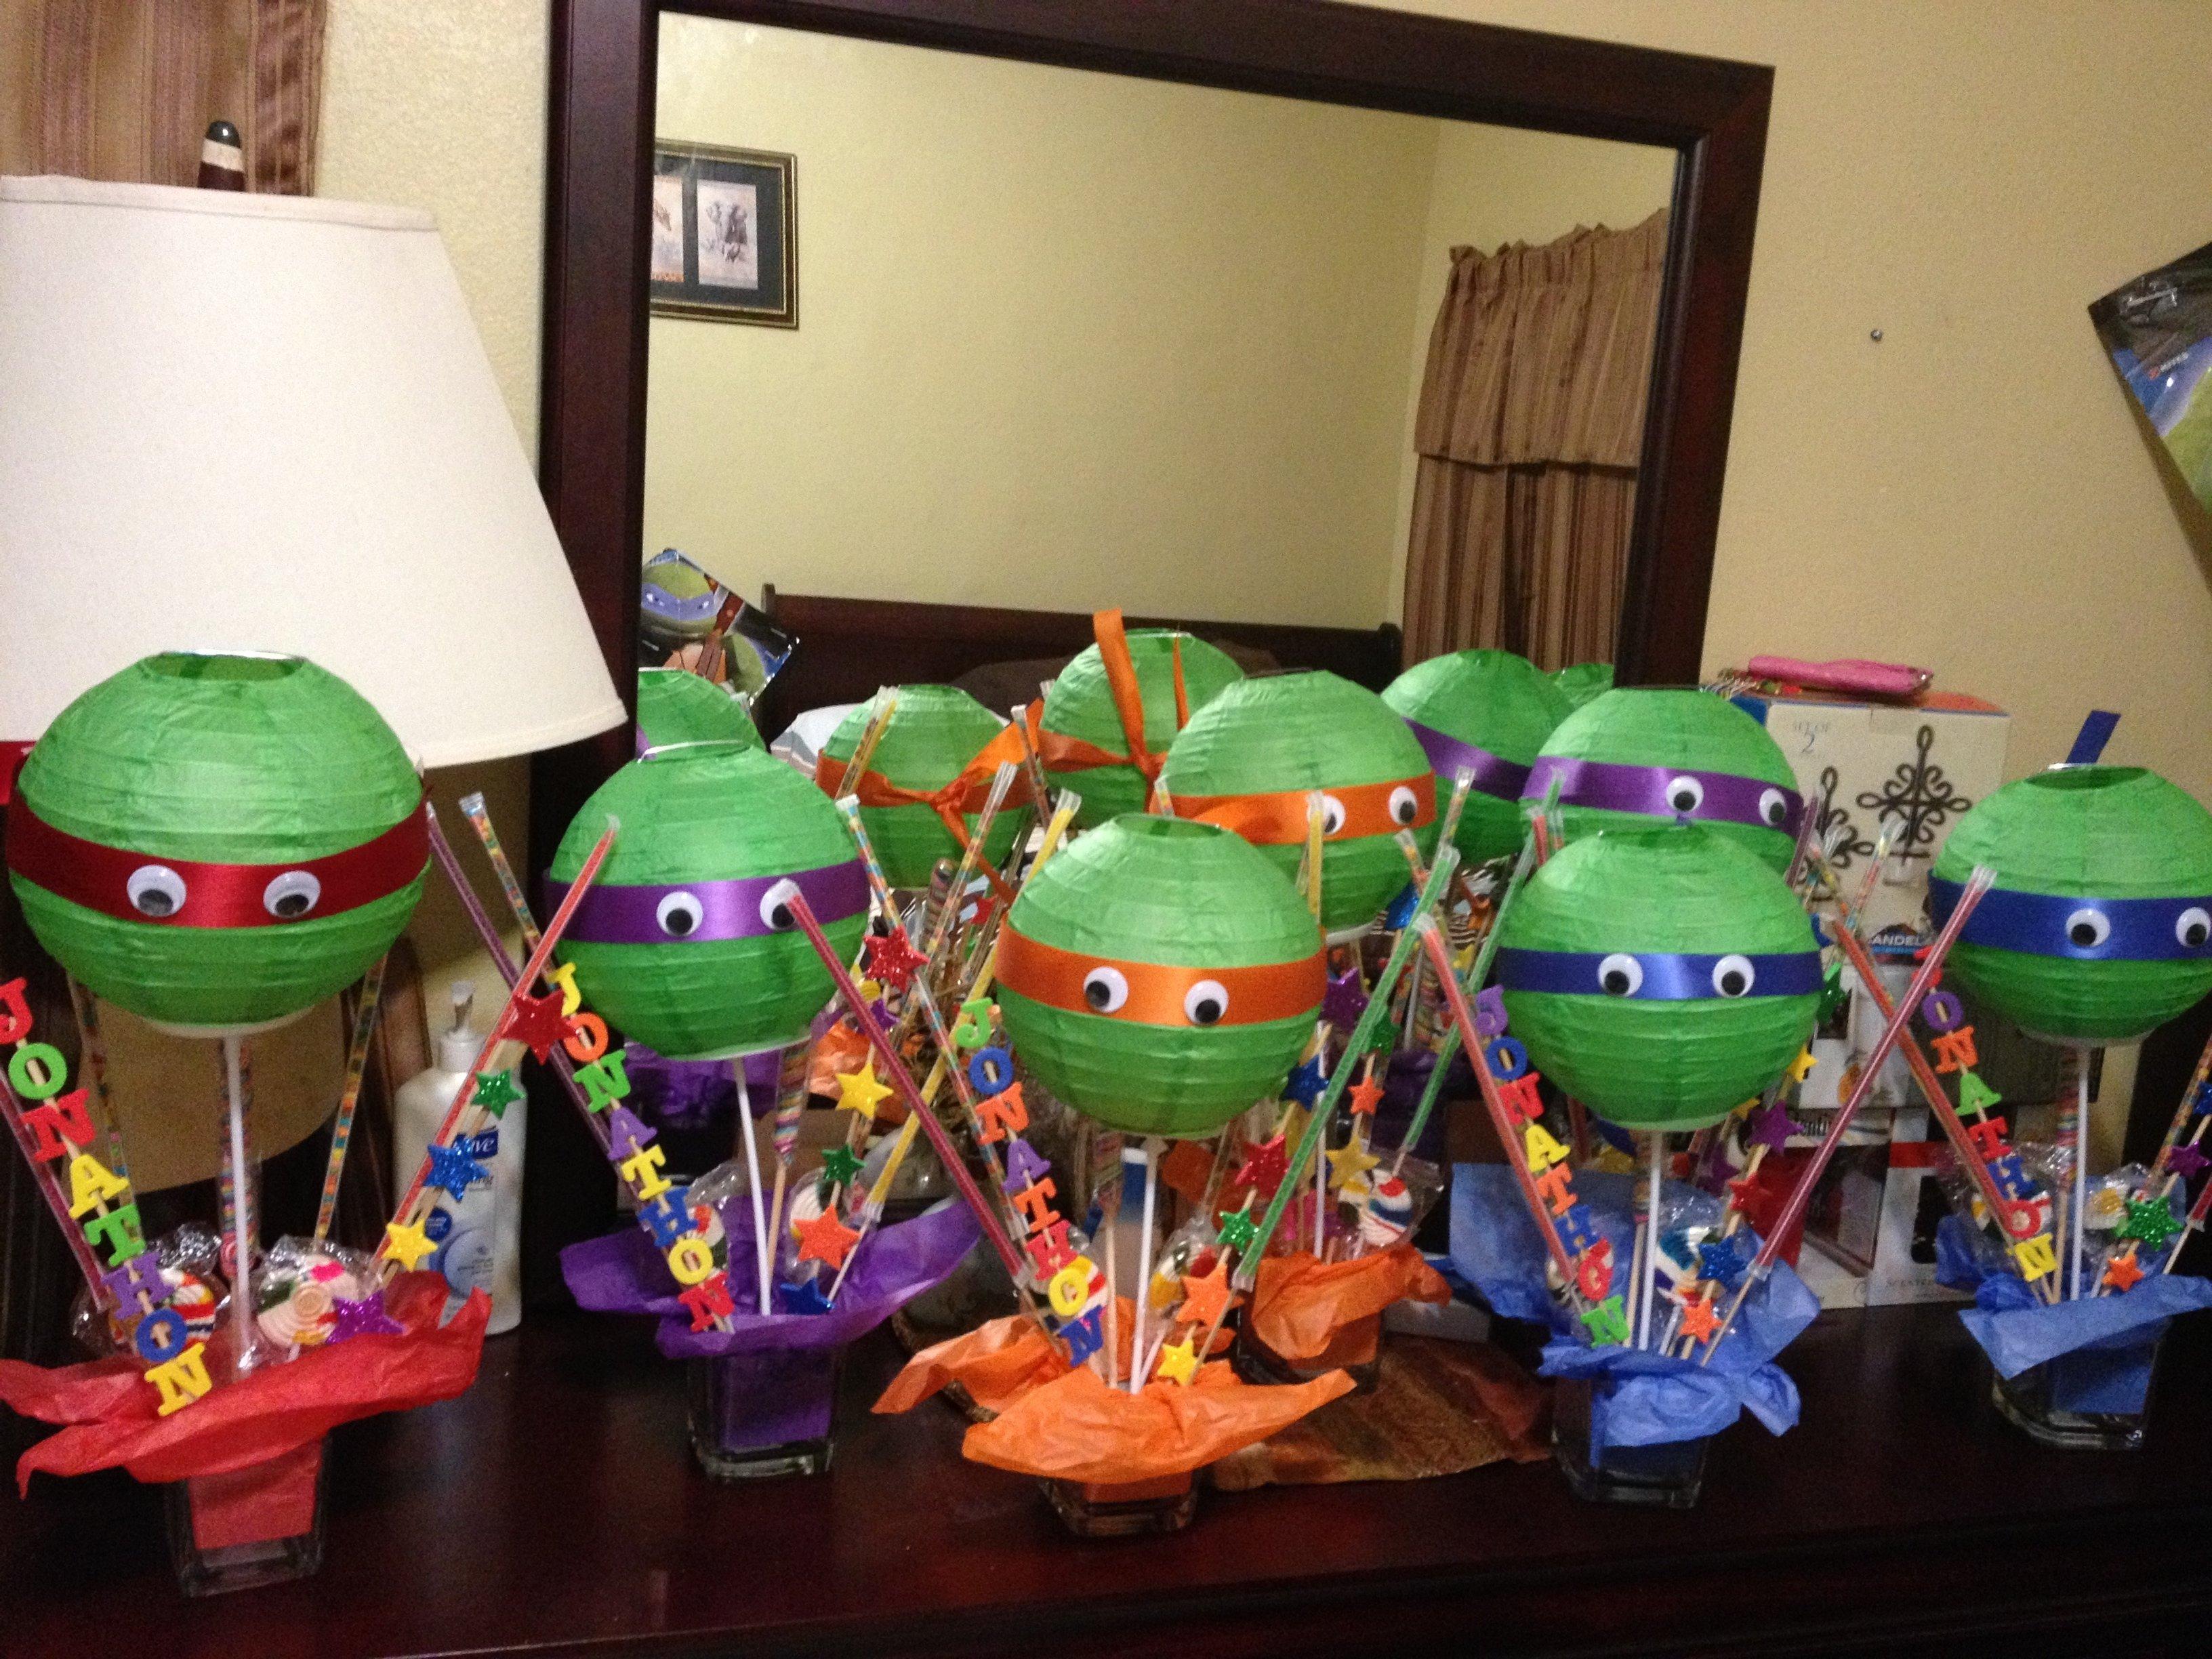 10 Fantastic Ninja Turtles Birthday Party Ideas furniture fascinating simple christmas table decoration ideas blue 1 2020